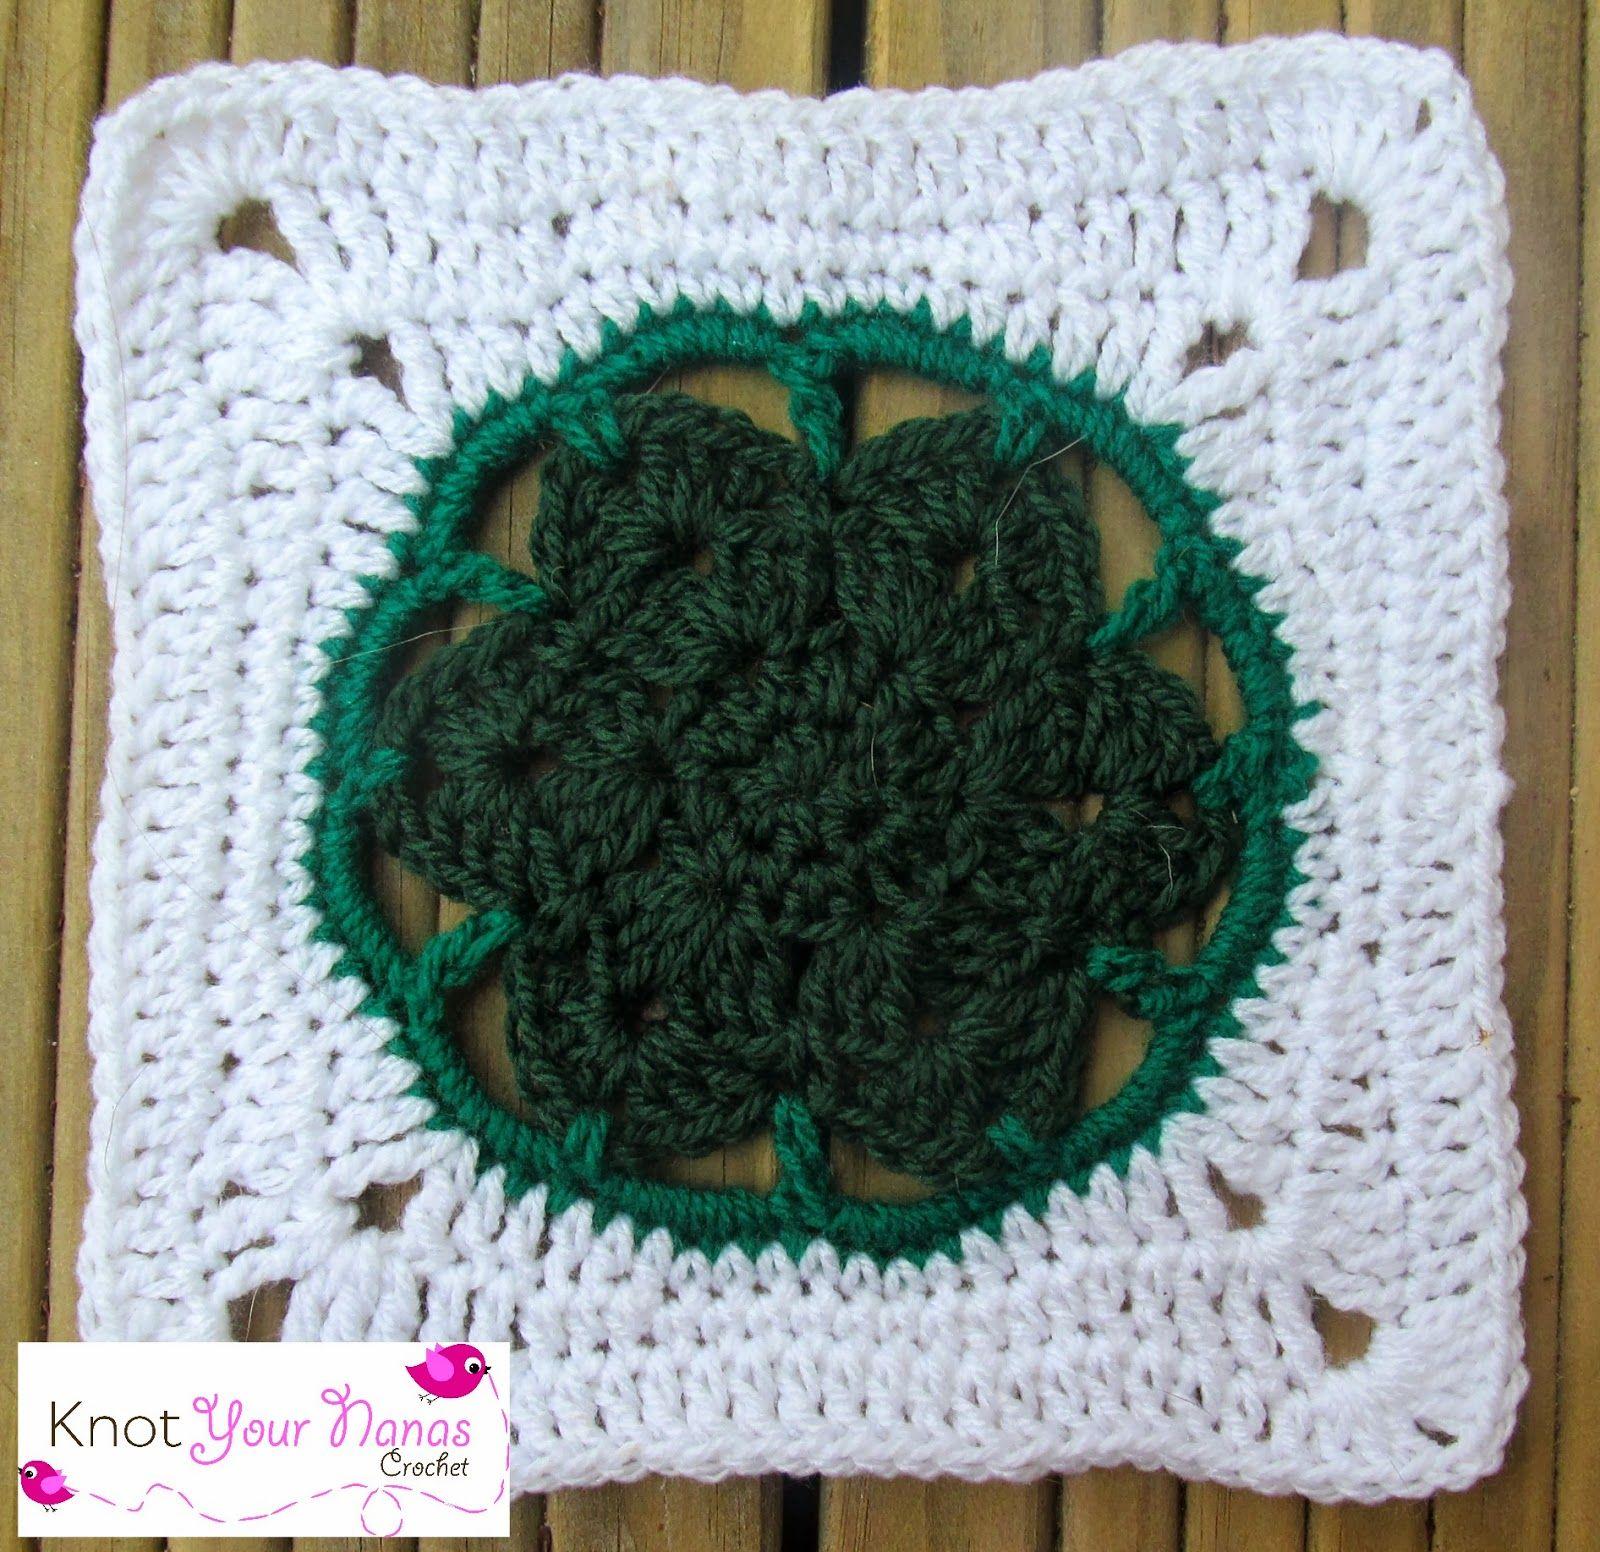 Knot Your Nana's Crochet: Granny Square Crochet Along Revisited (Week Twenty Nine)